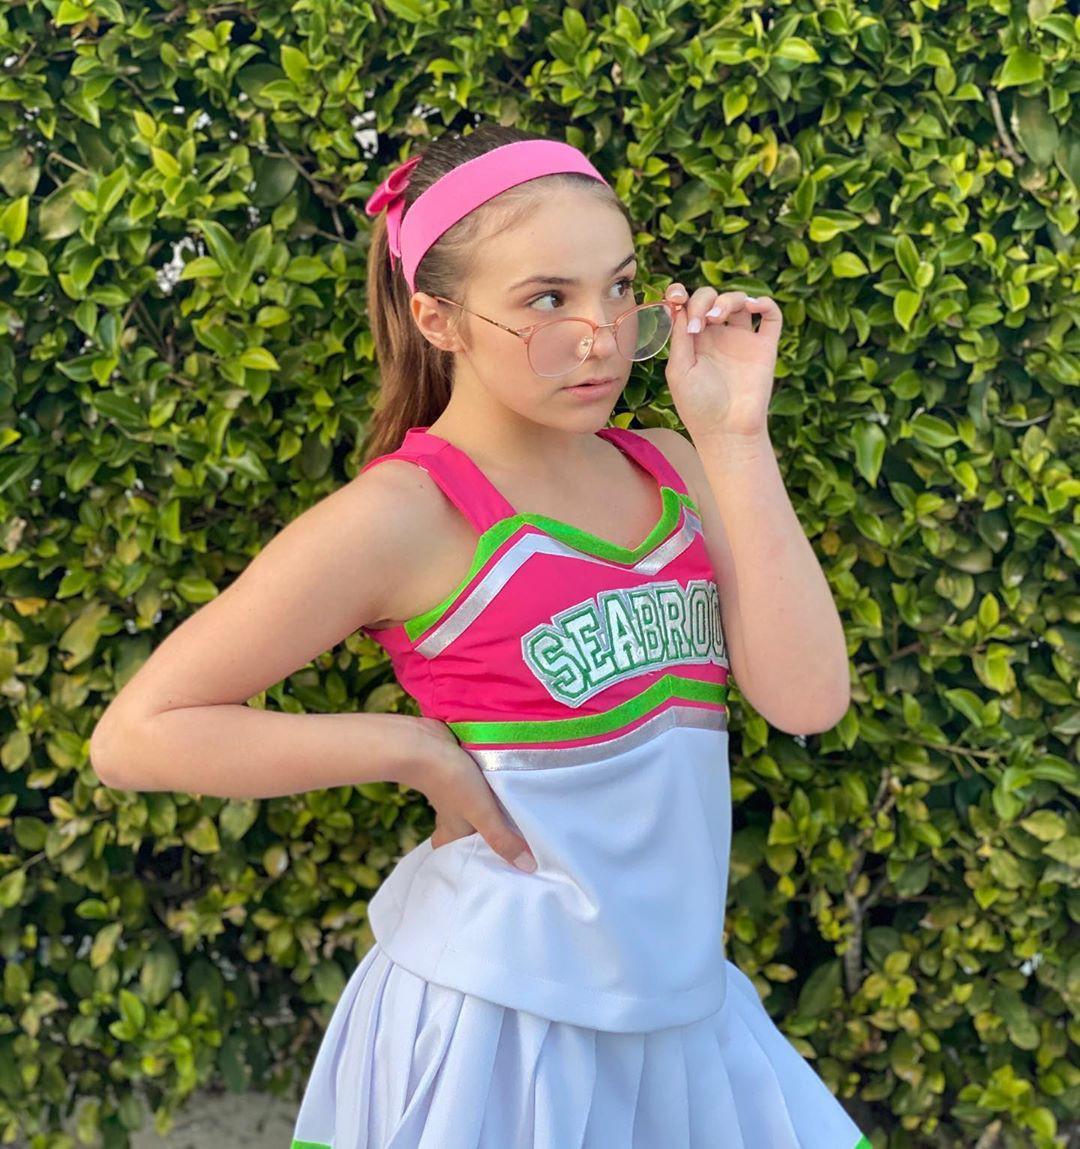 pink instagram fashion with sportswear, uniform, attire ideas